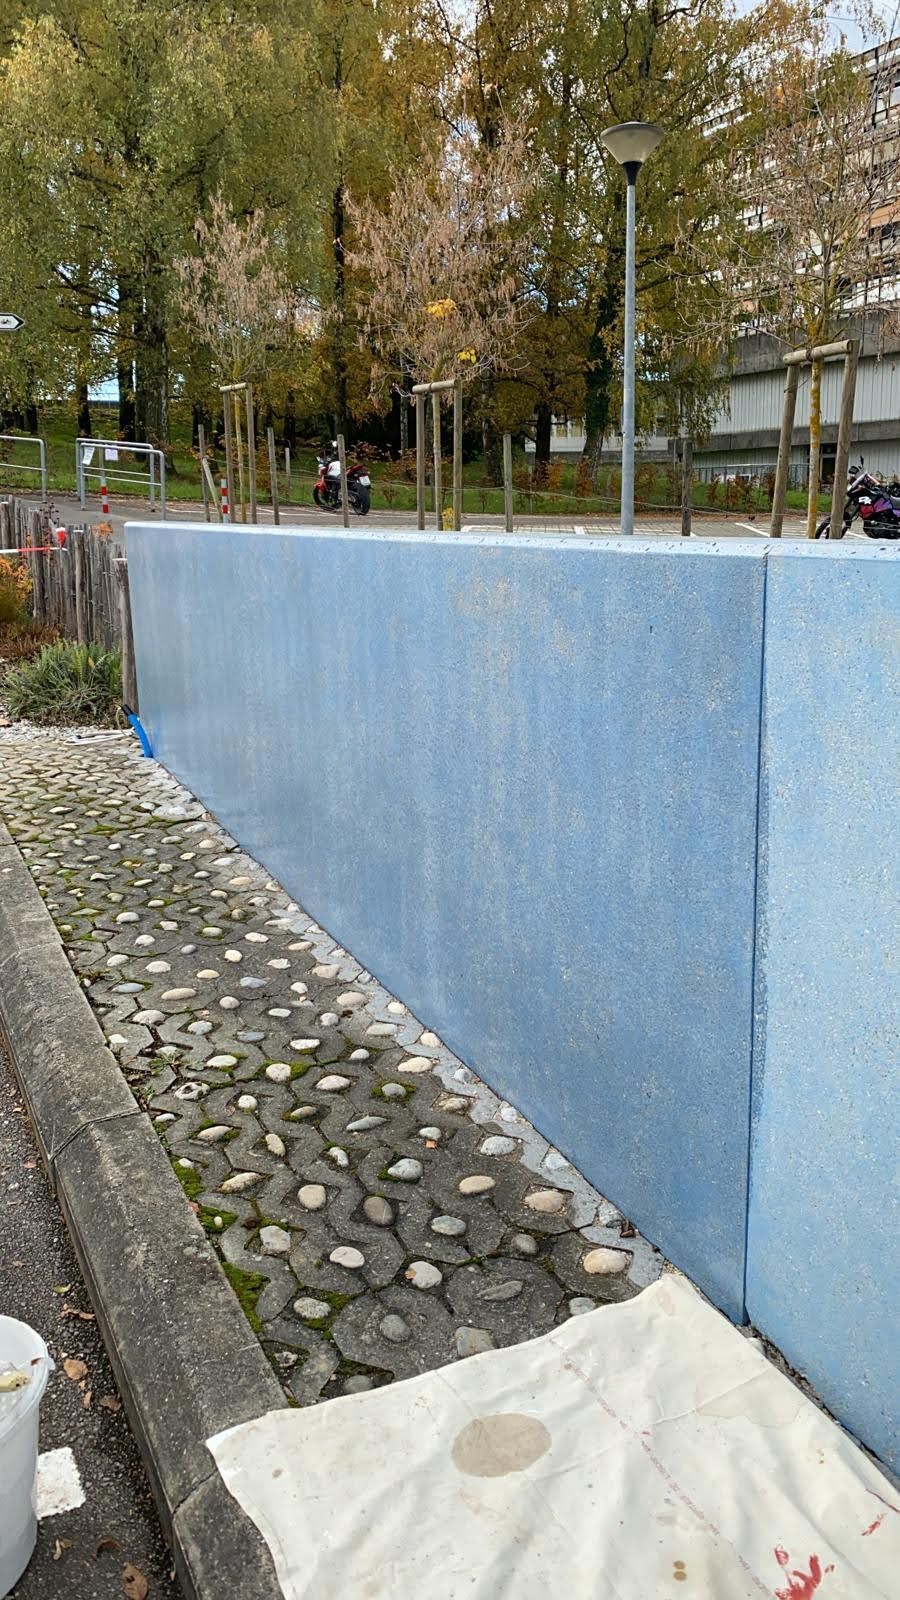 Traitement anti-graffiti (la teinte va s'éclaircir au séchage)